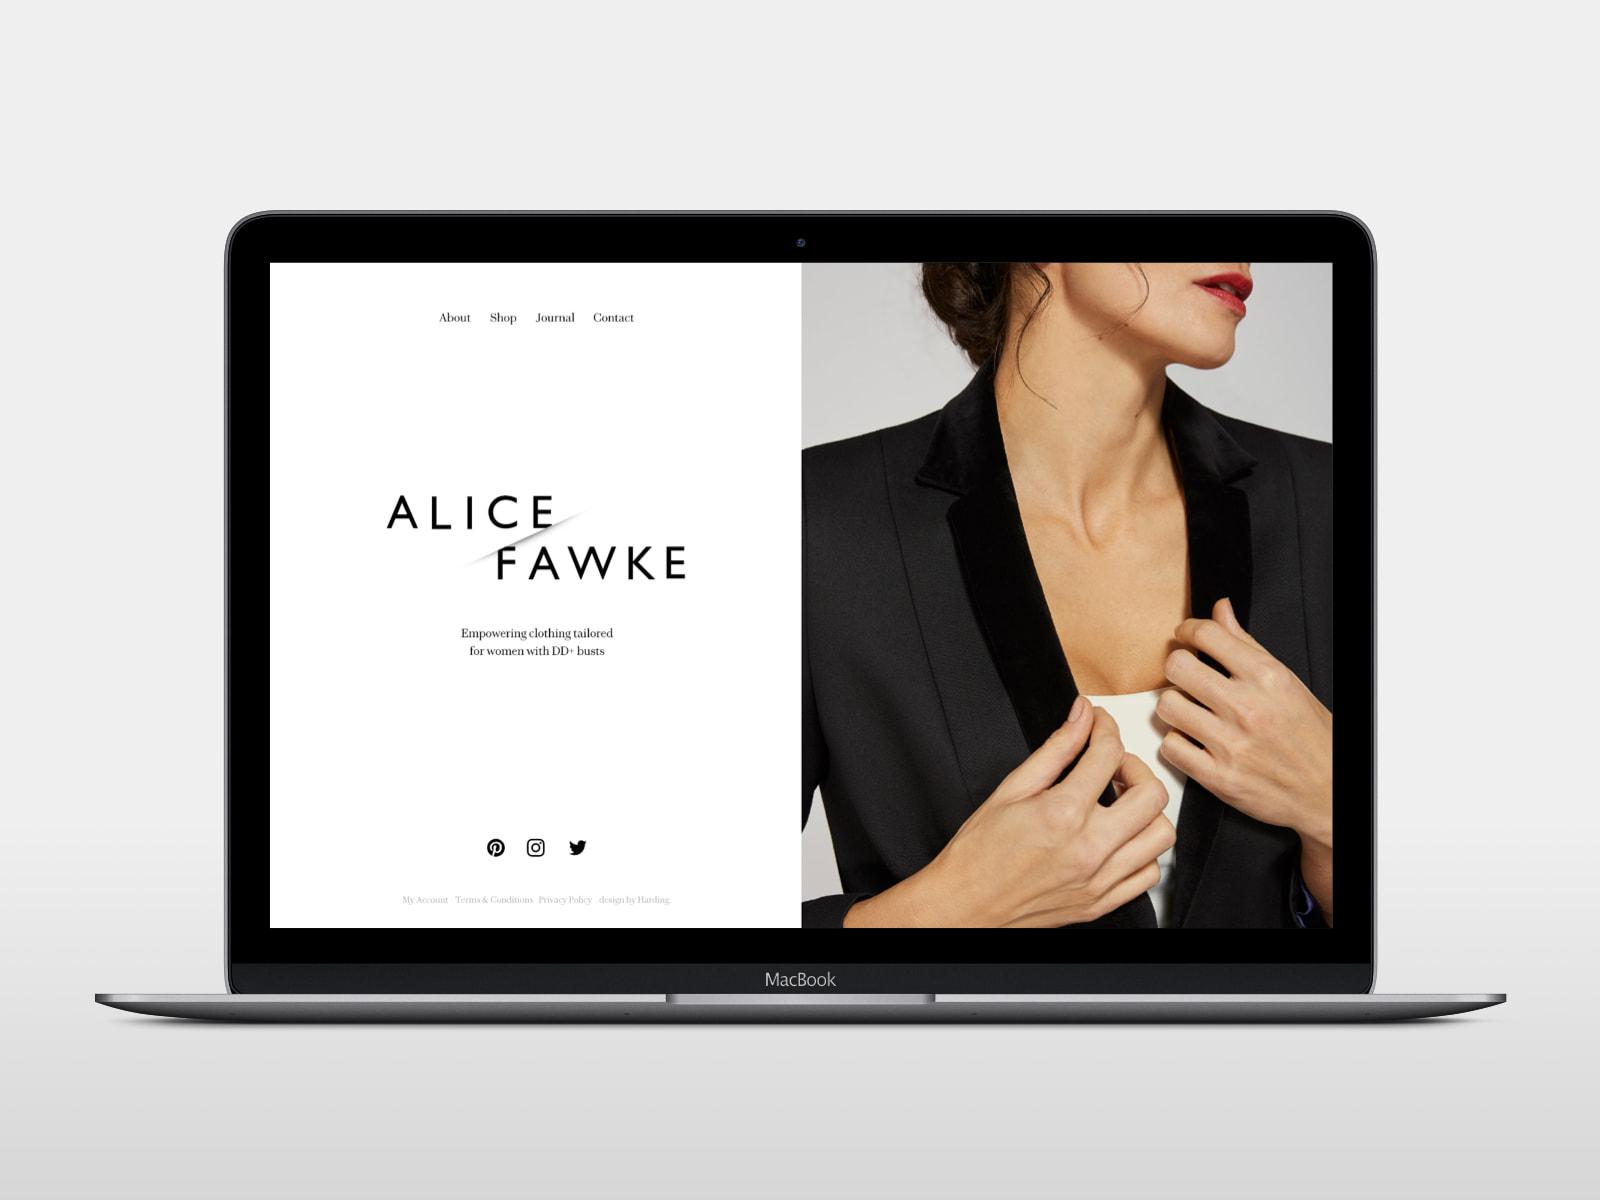 Alice Fawke